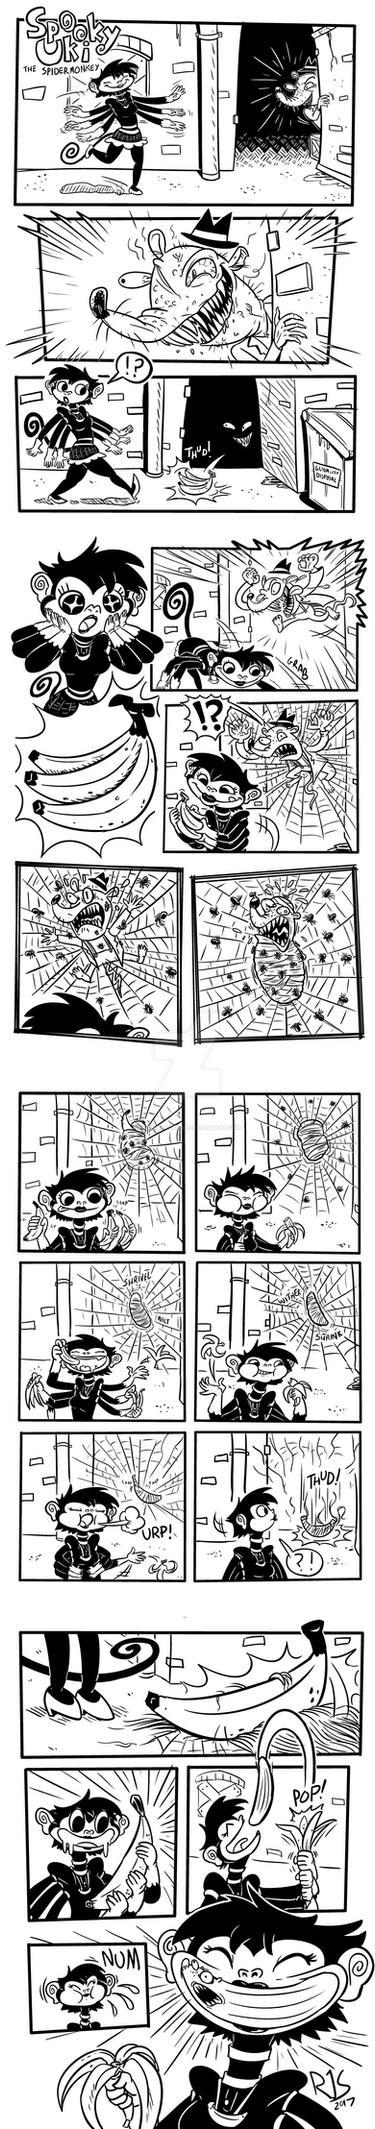 Spooky Uki comic #1 by ronnieraccoon